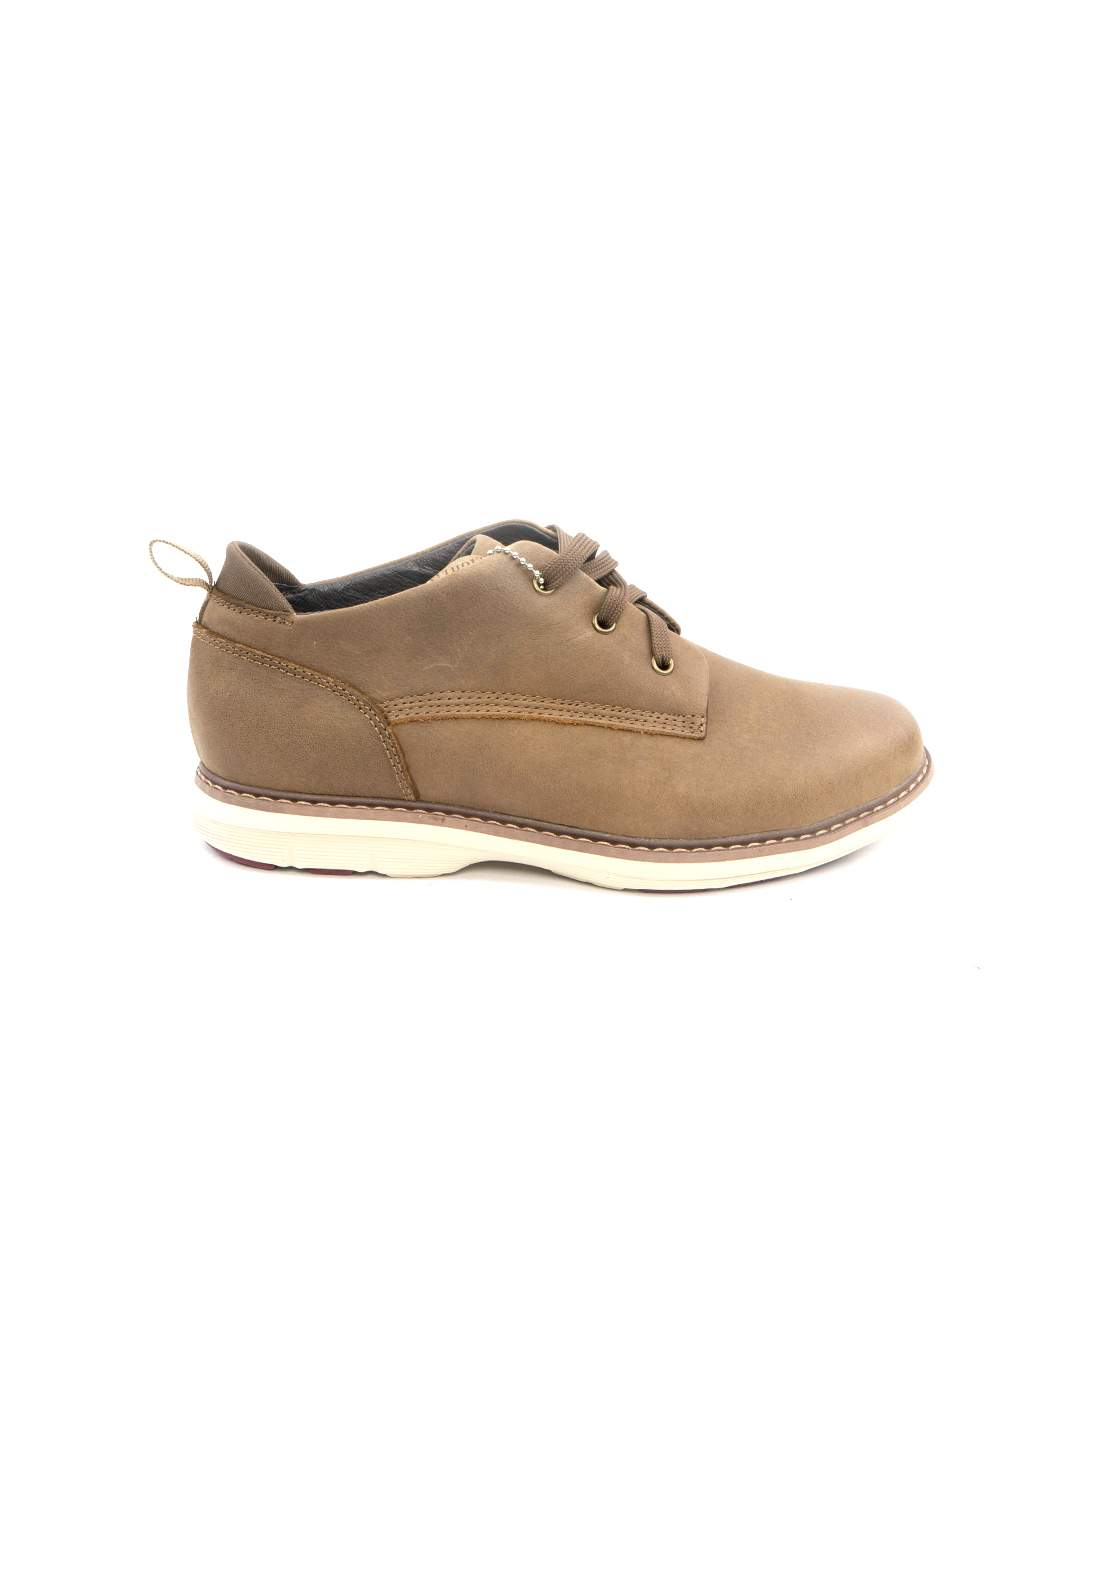 حذاء رجالي بيجي اللون من Carwil